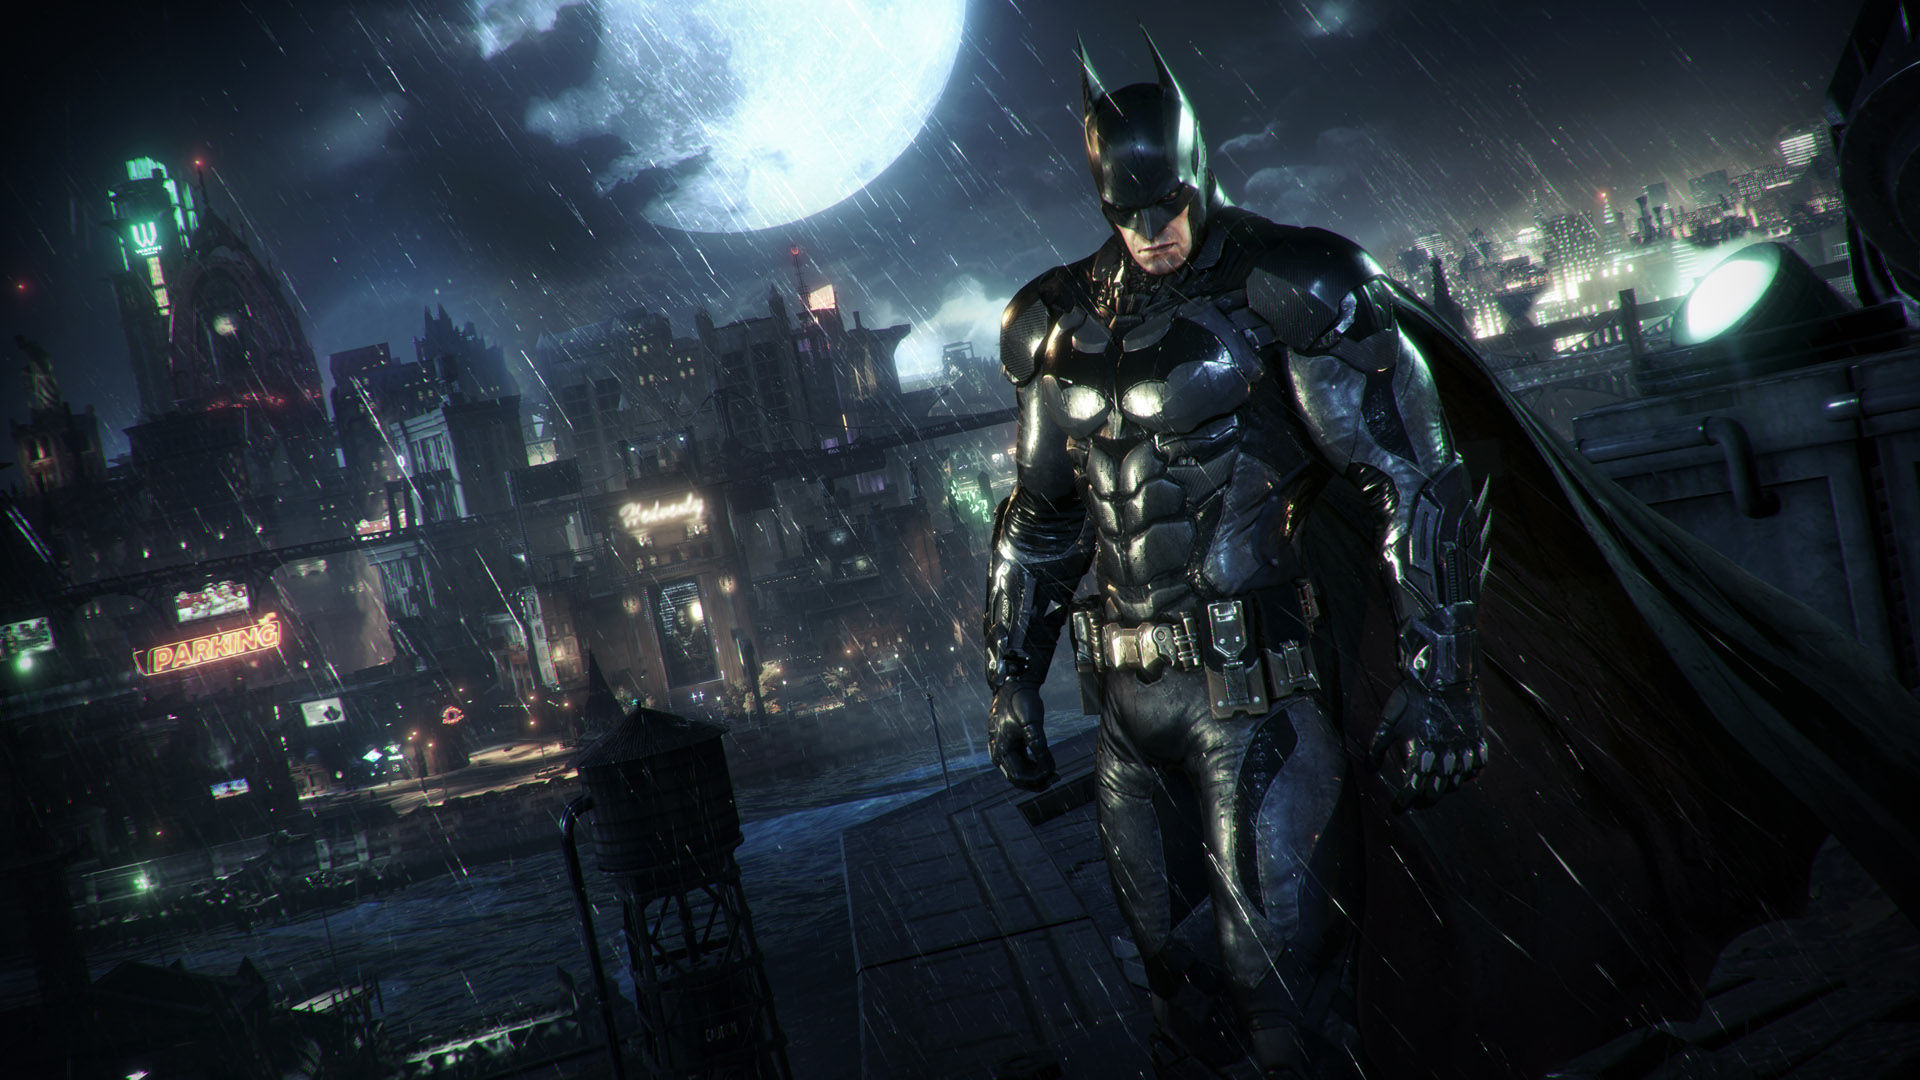 Batman: Arkham Knight developer says the aim is to make ...